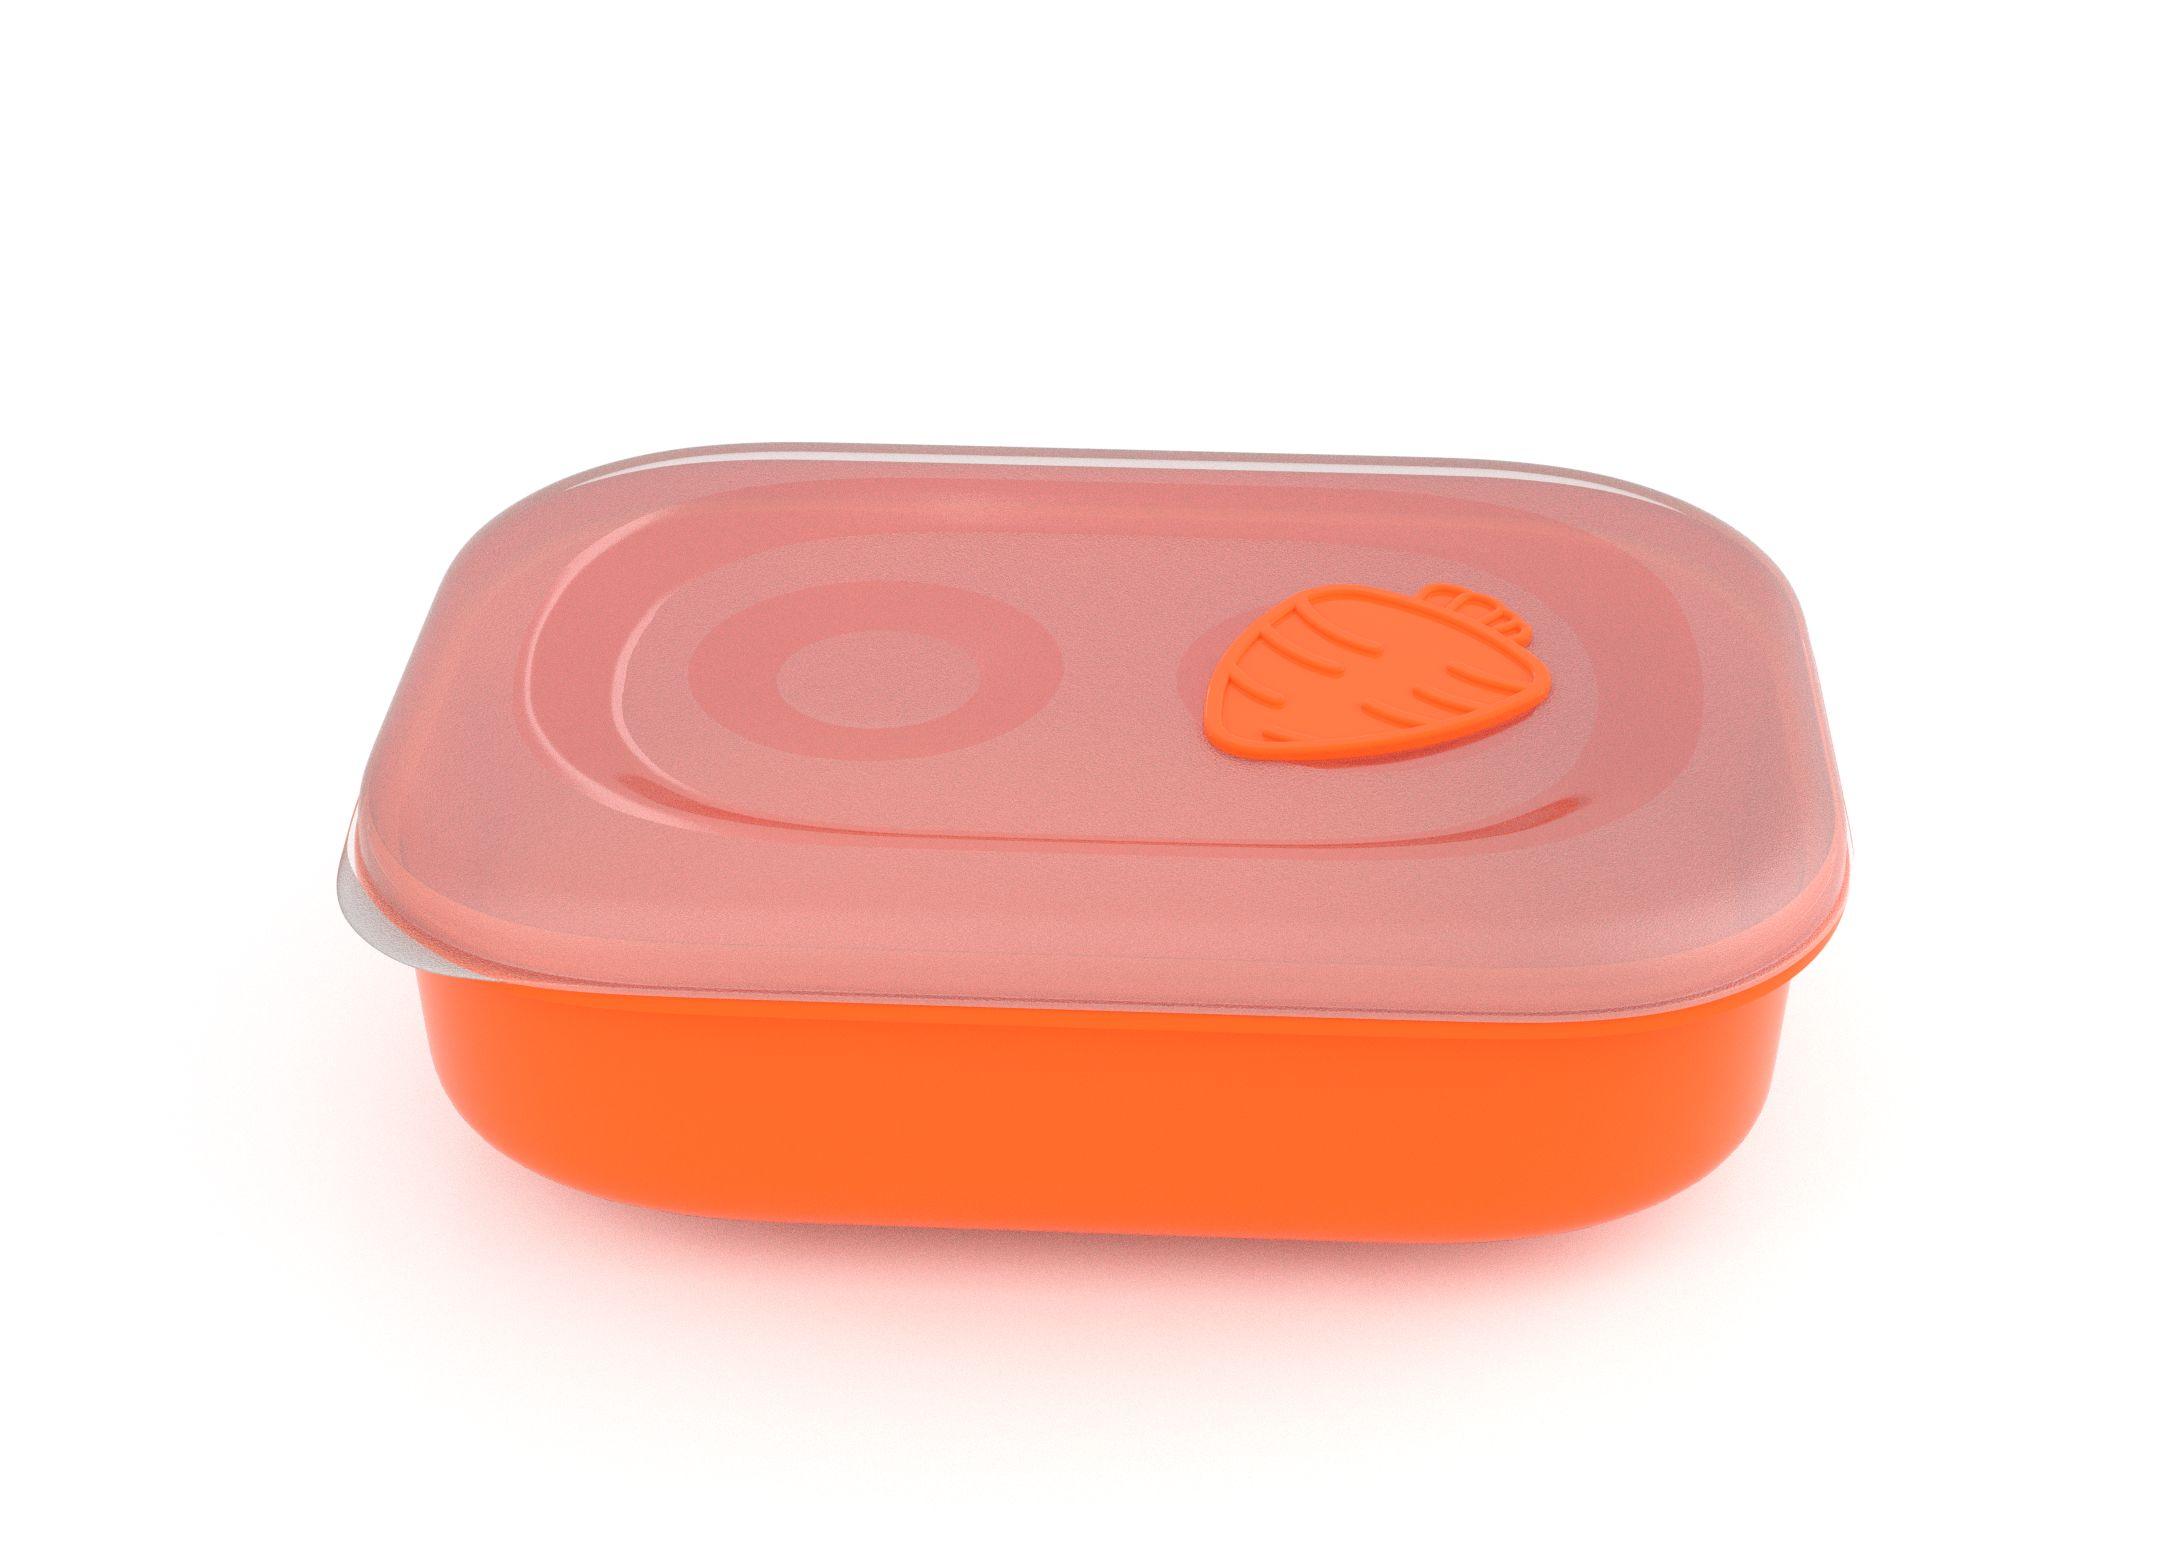 Tama Lock Rectangular Food Container 1.8l 9181 with Steam Release Carrot Valve Orange